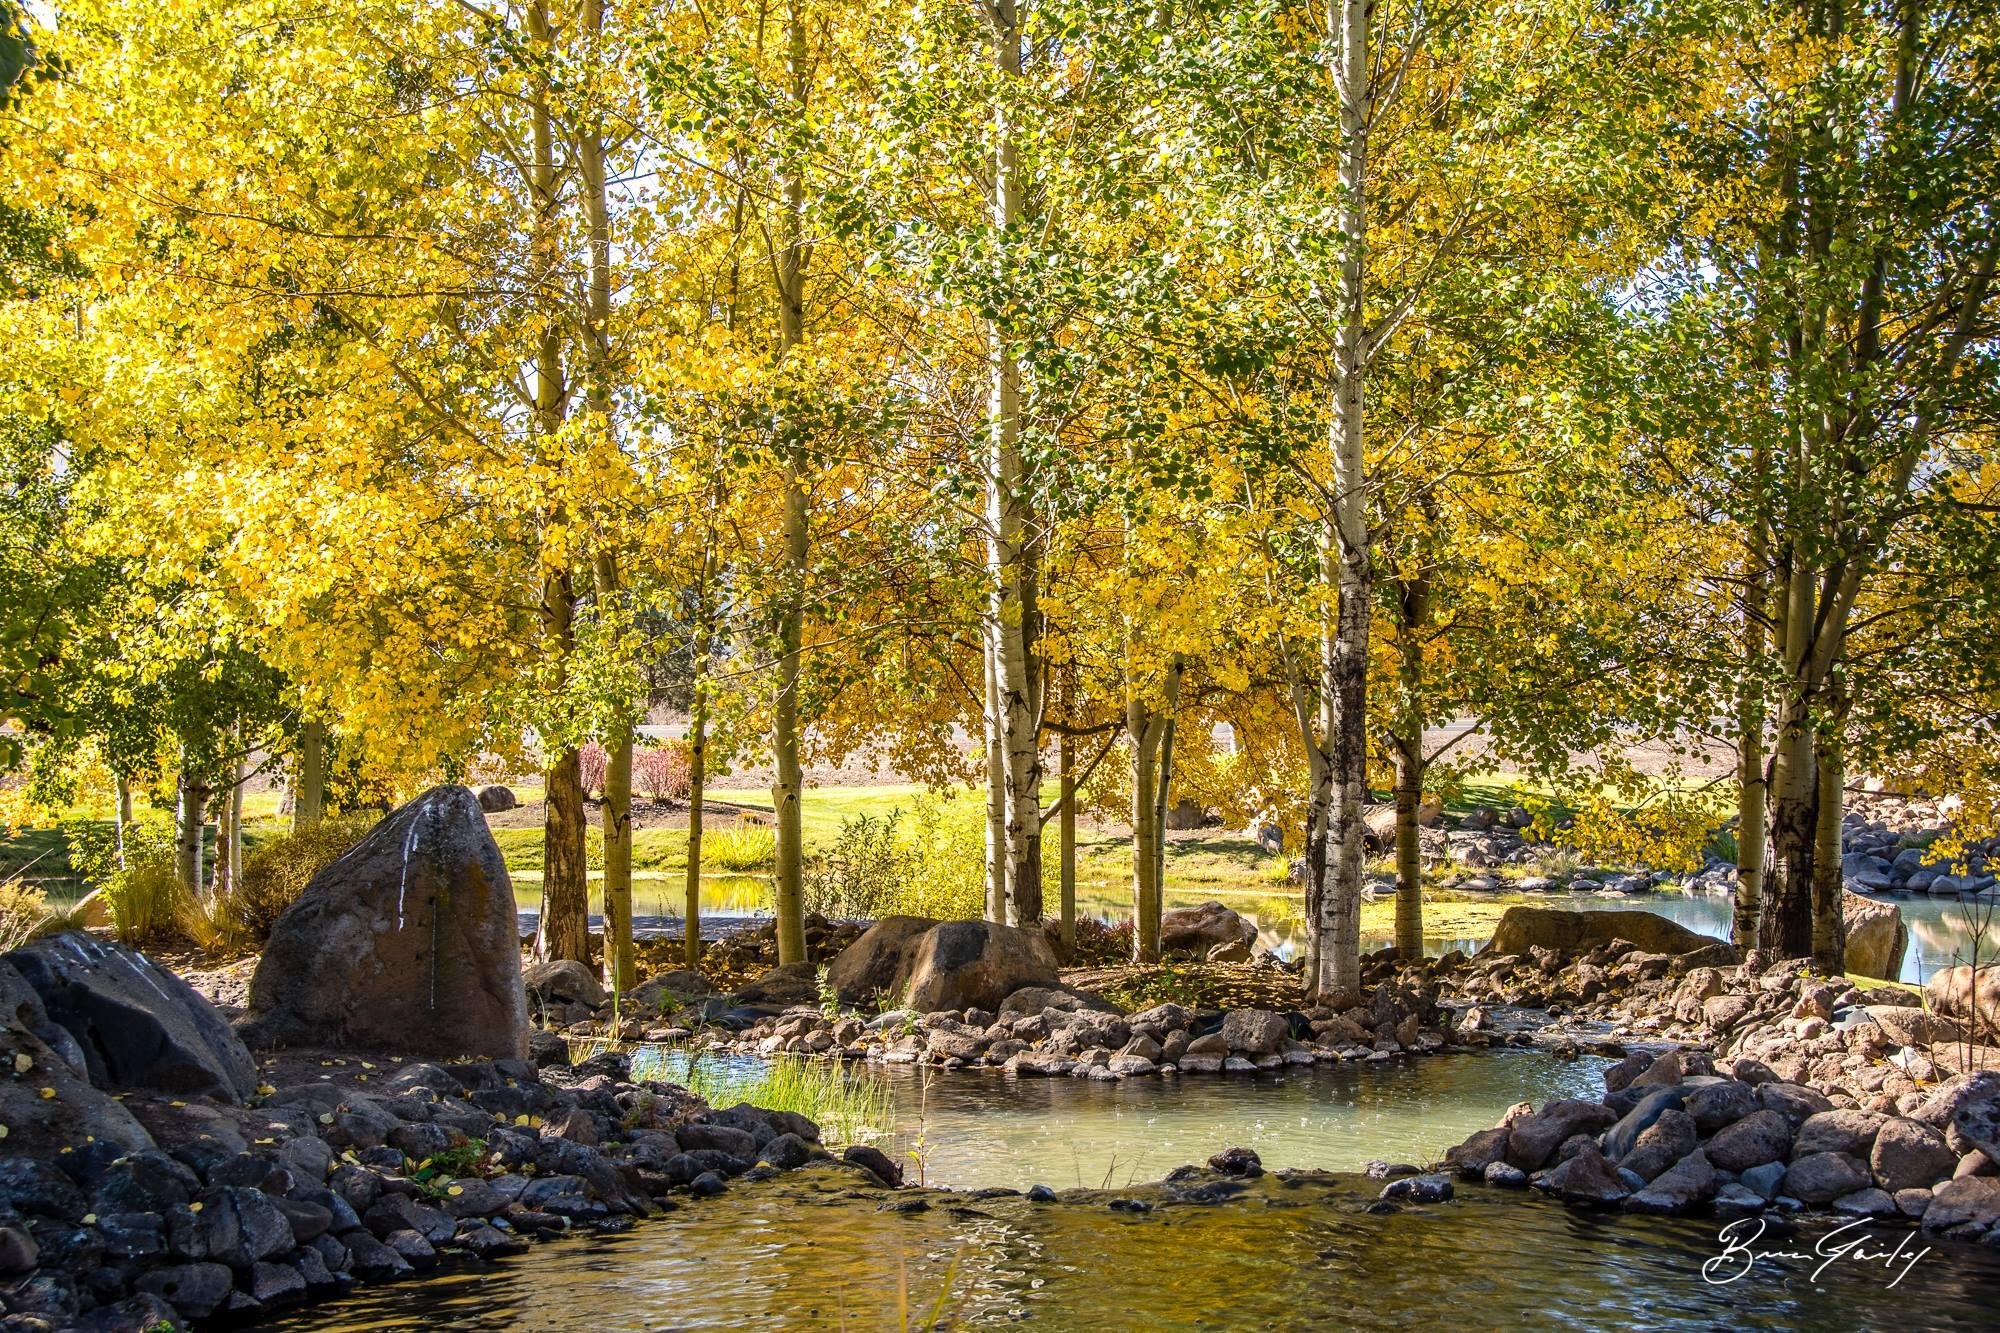 Fall Colors at the Running Y Ranch Resort - Image: Brian Gailey